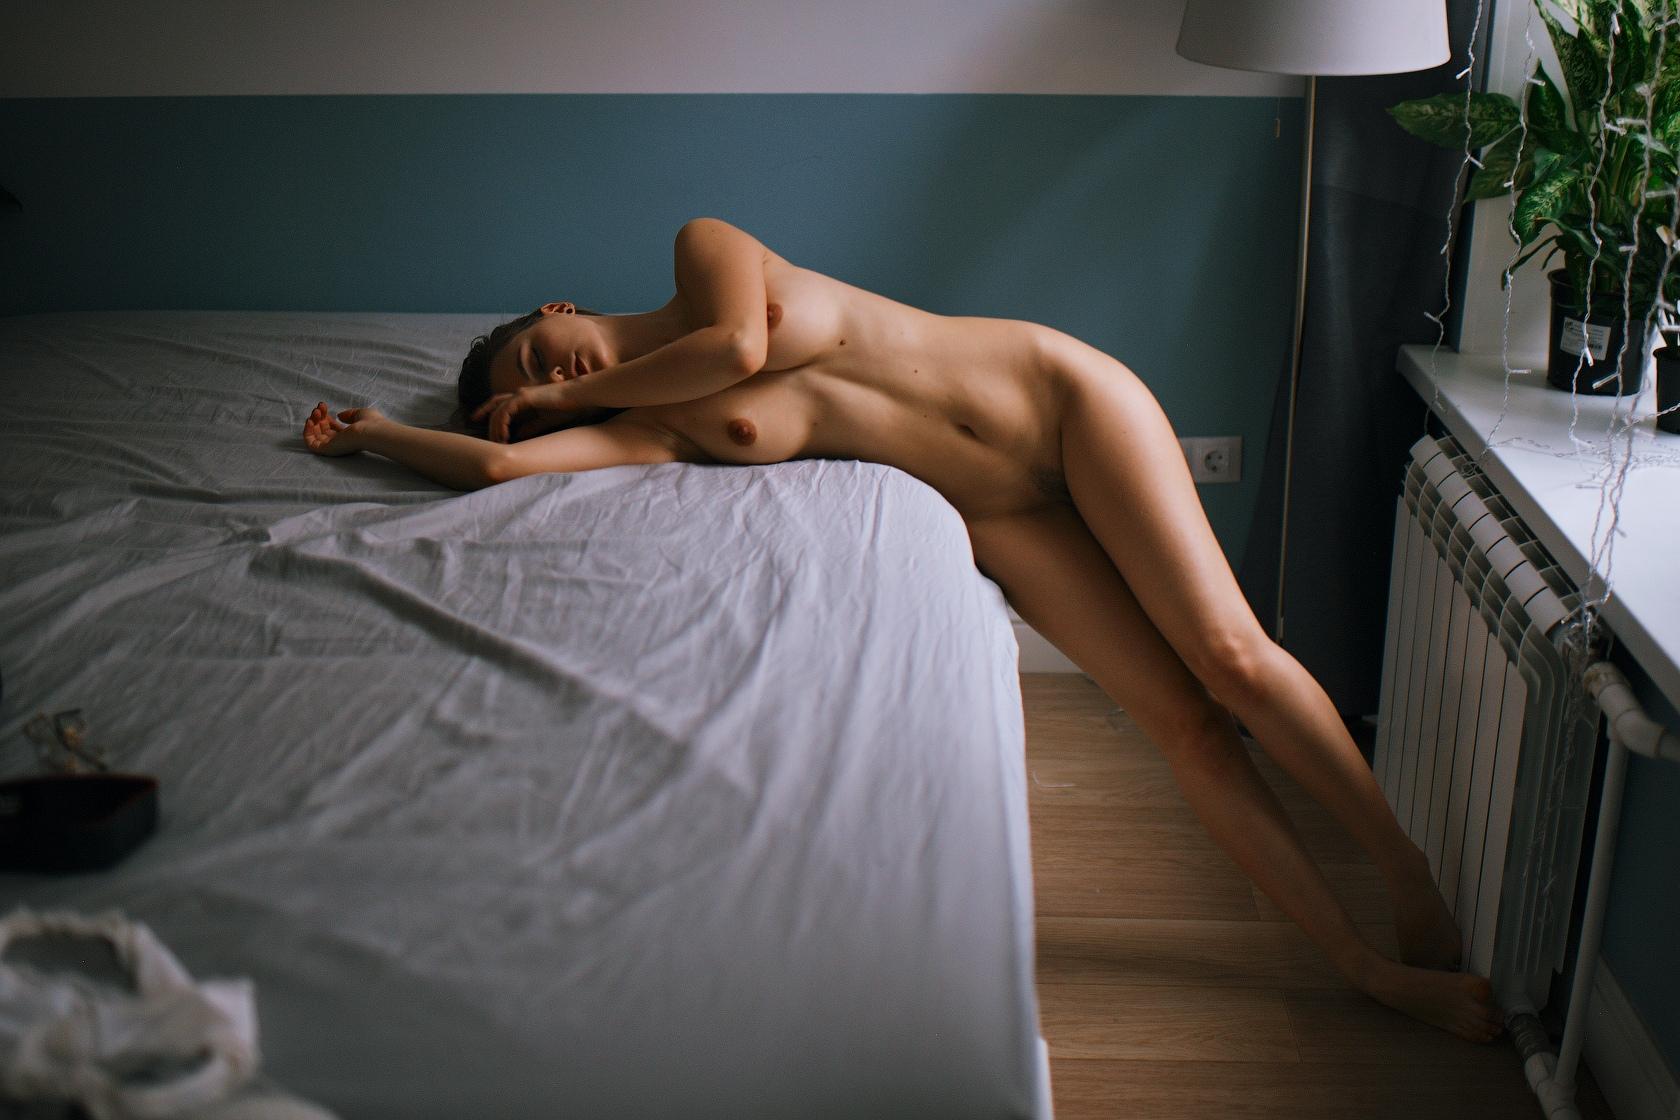 https://www.youngfolks.ru/pub/photograph-maratsafin-33851215